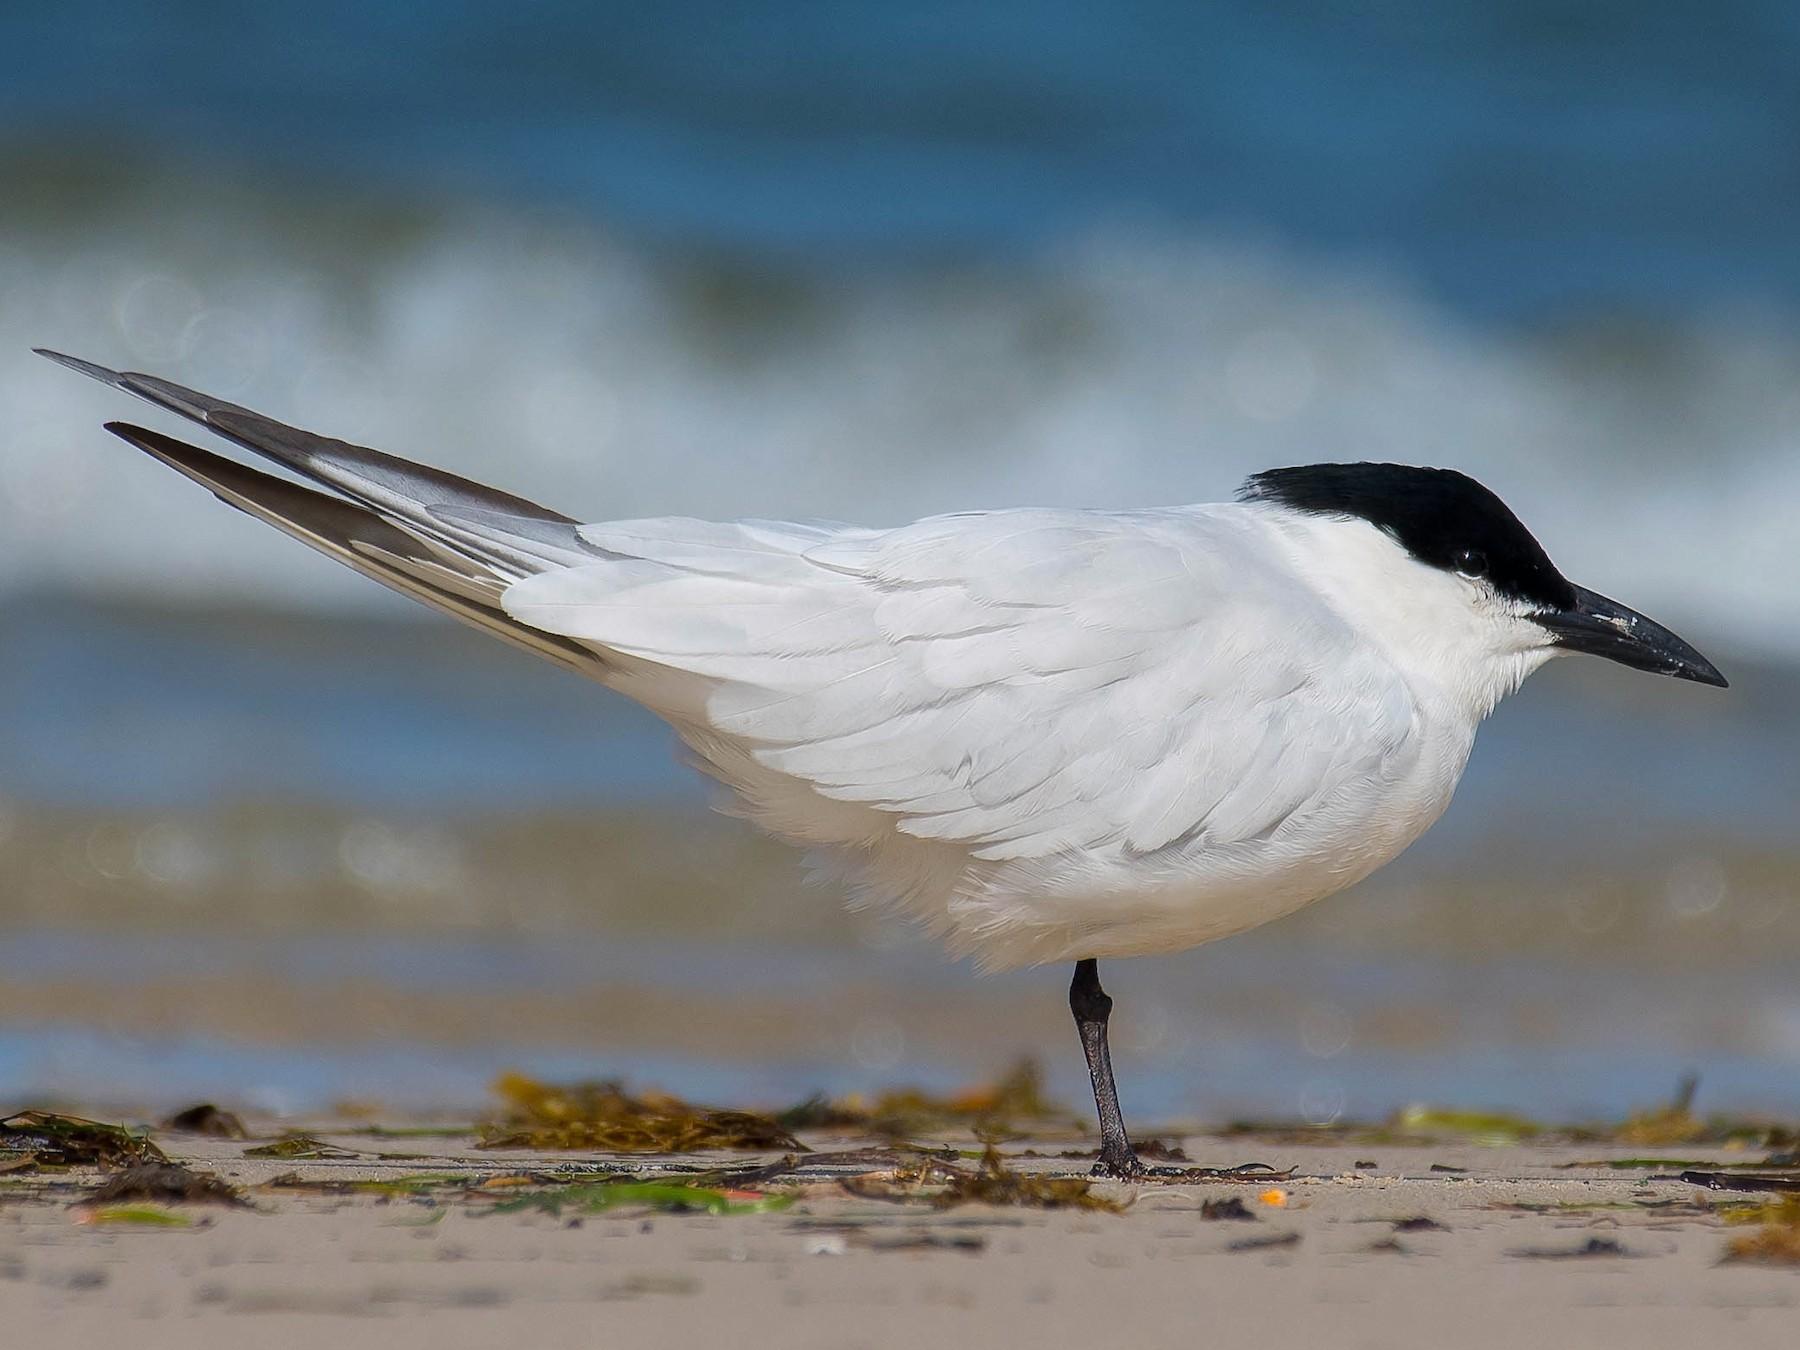 Gull-billed Tern - Terence Alexander